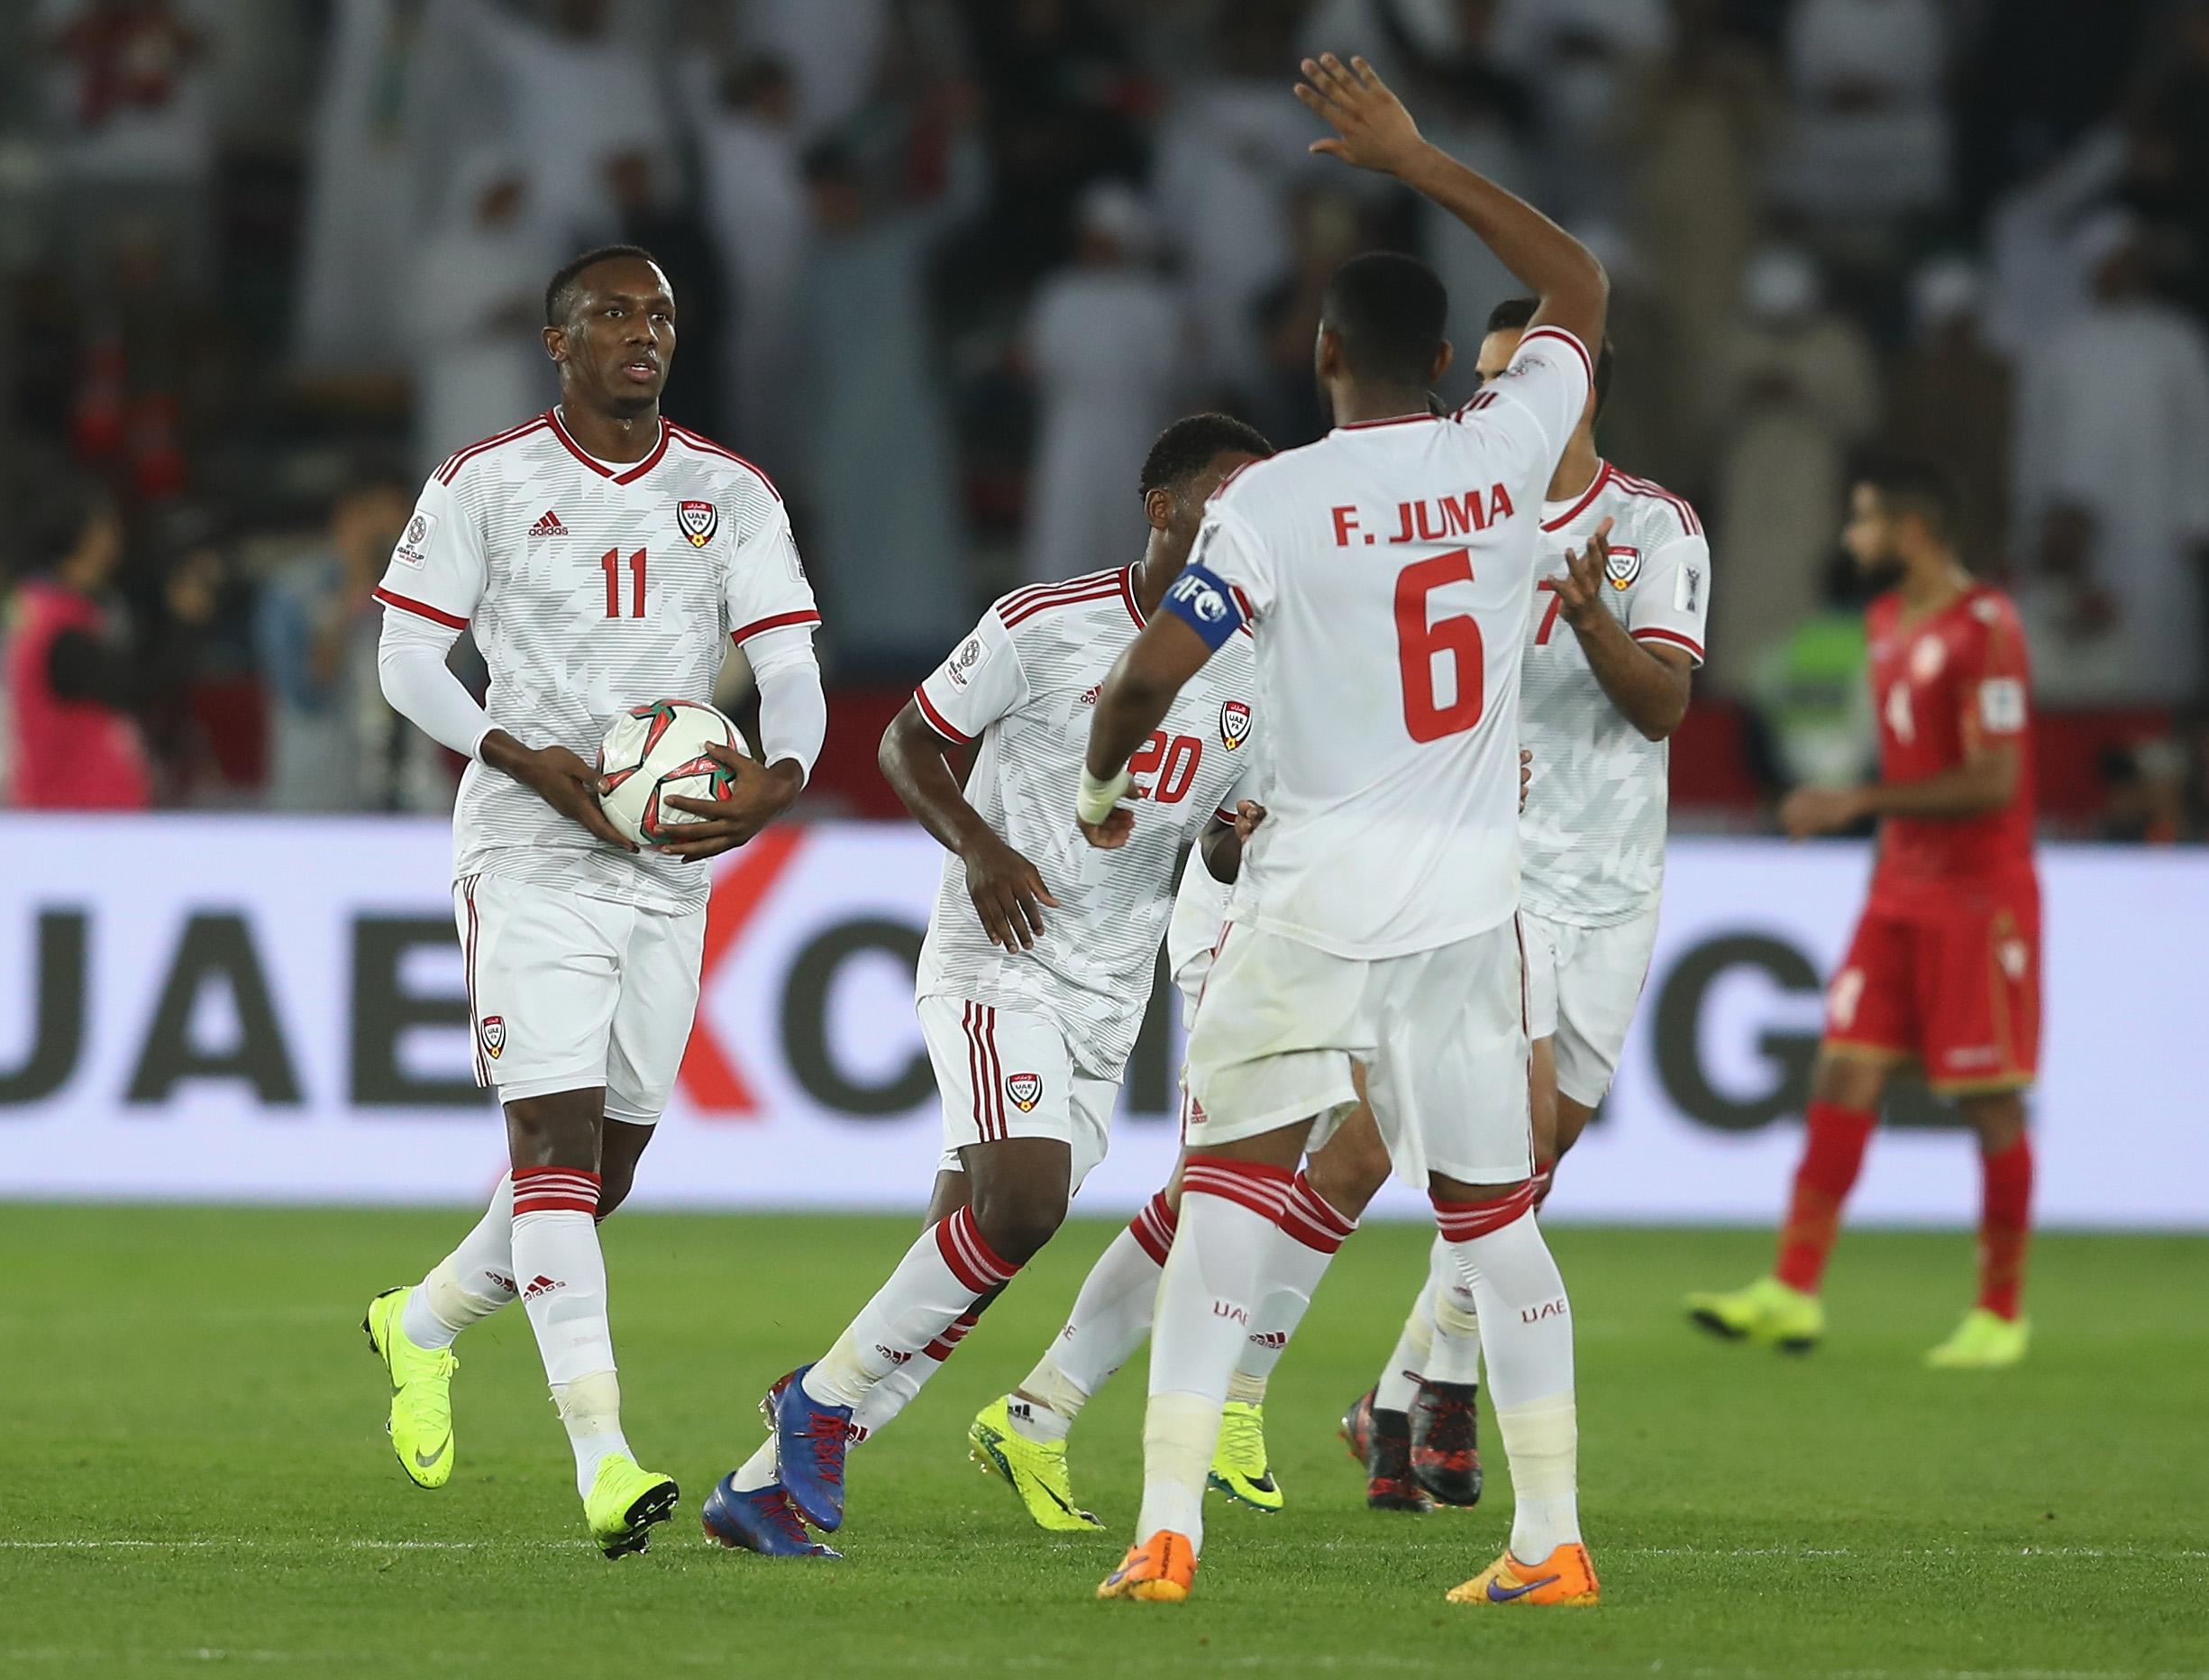 Khalil Ahmed Fares Juma UAE AFC Asian Cup 2019